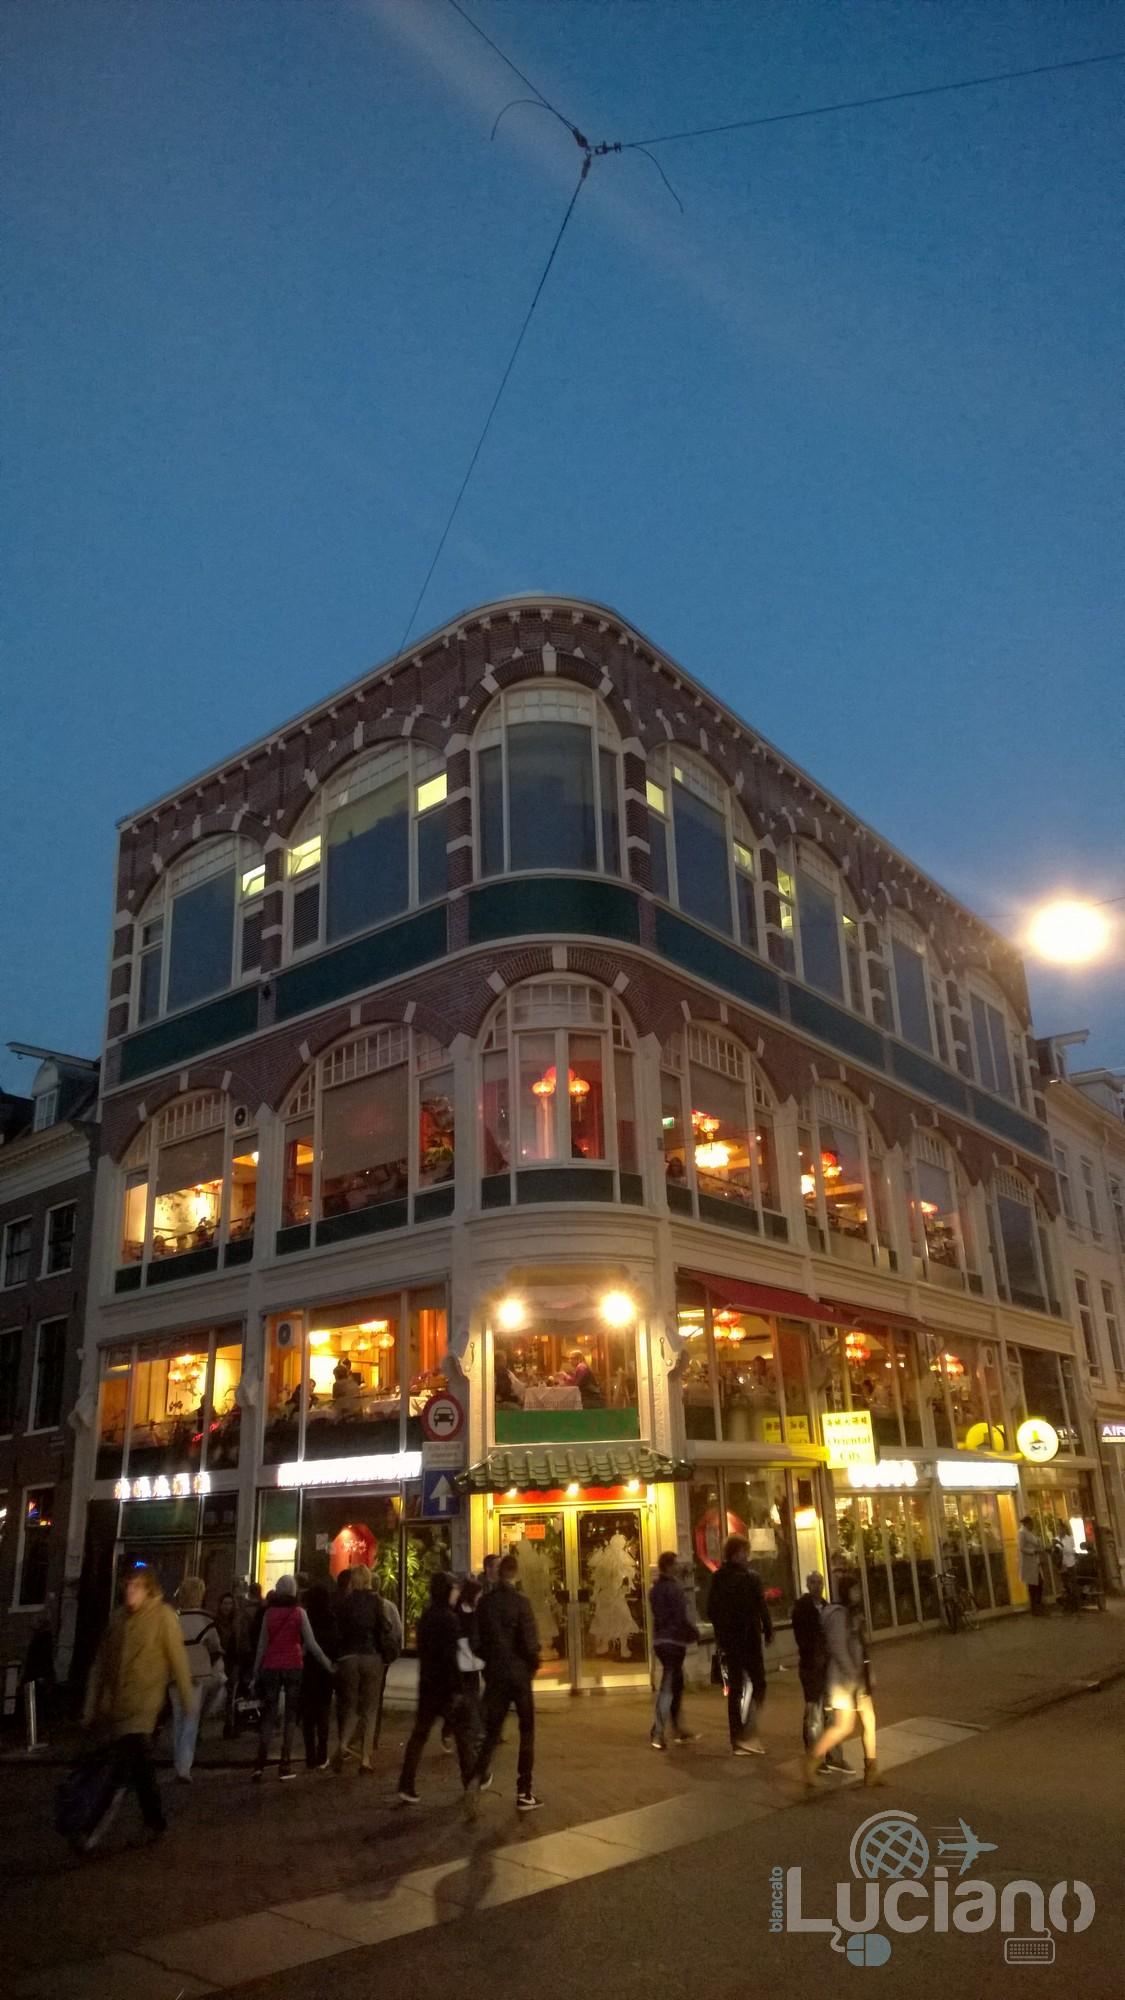 amsterdam-2014-vueling-lucianoblancatoit (43)